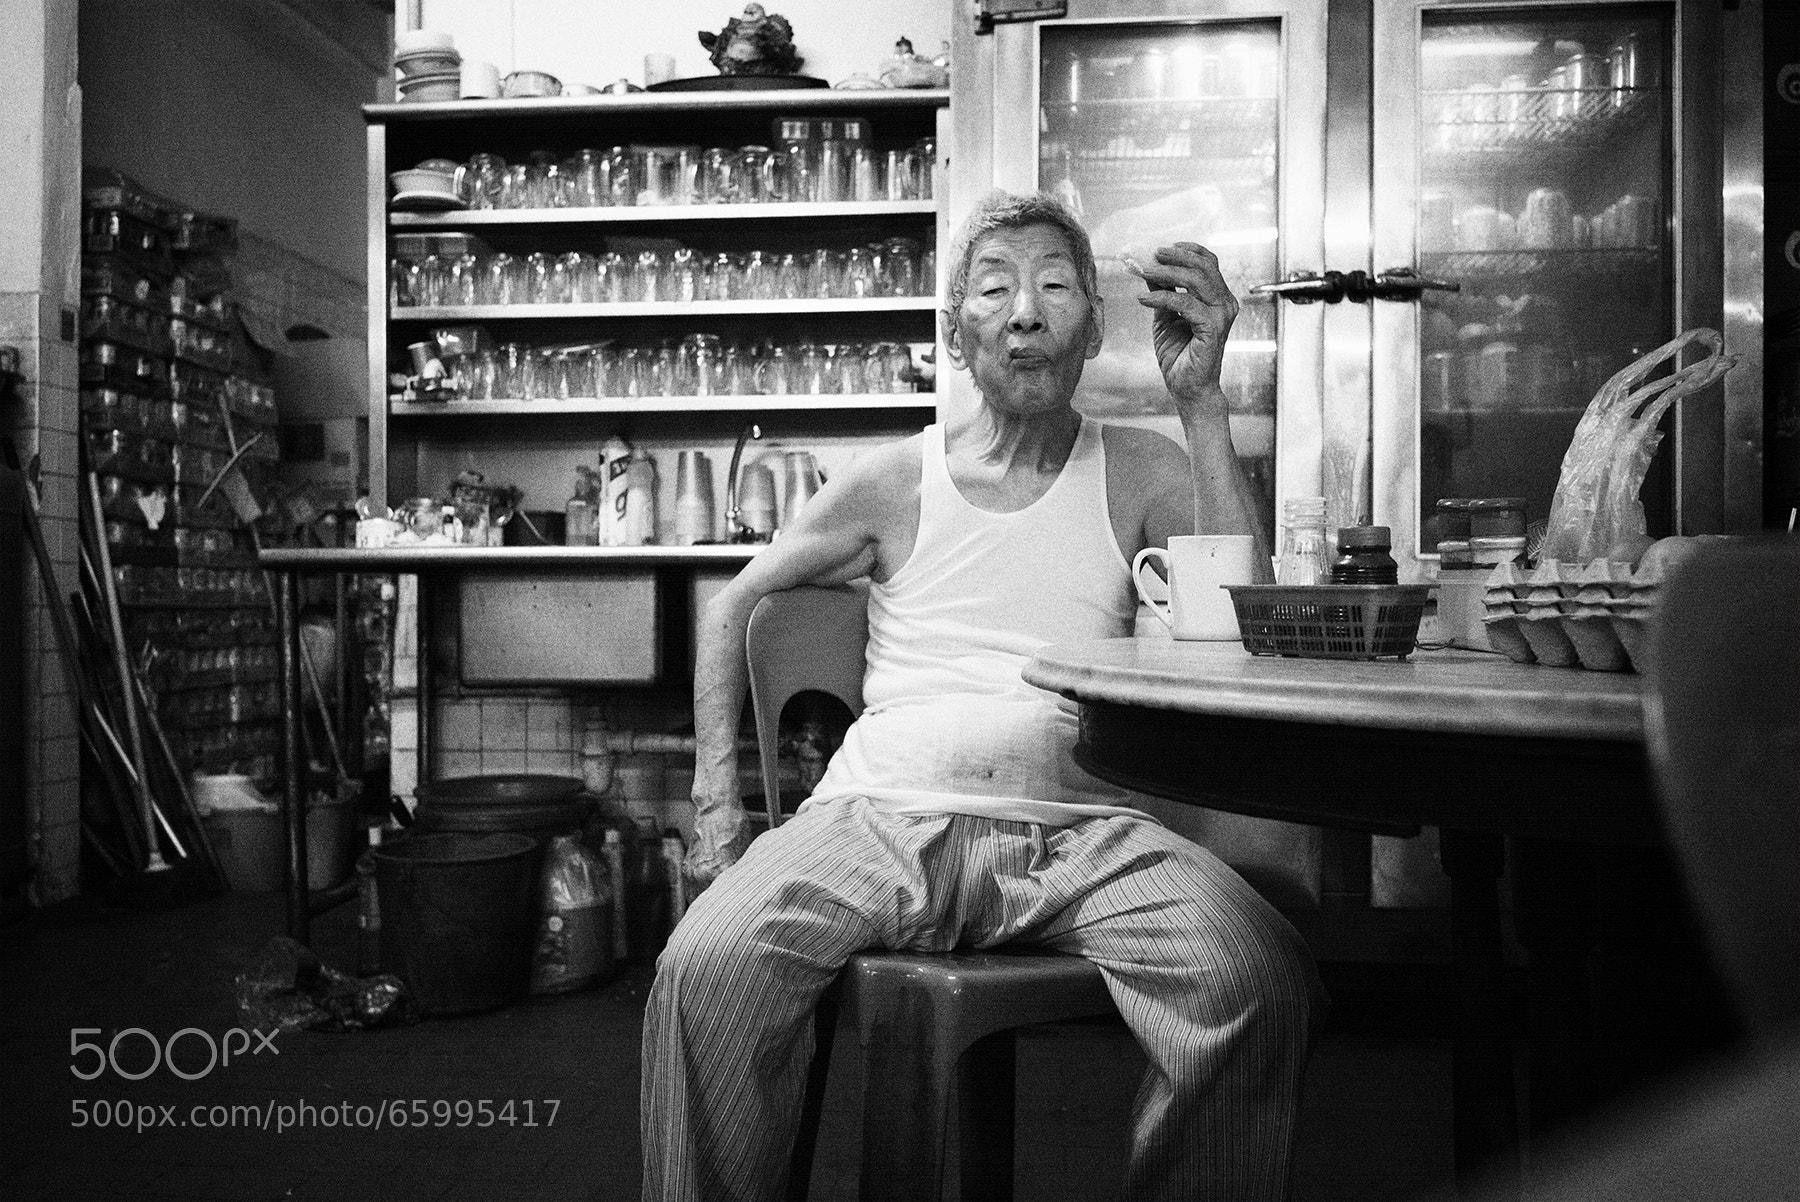 Photograph caffeine dreams, 2014 by  momofuku on 500px